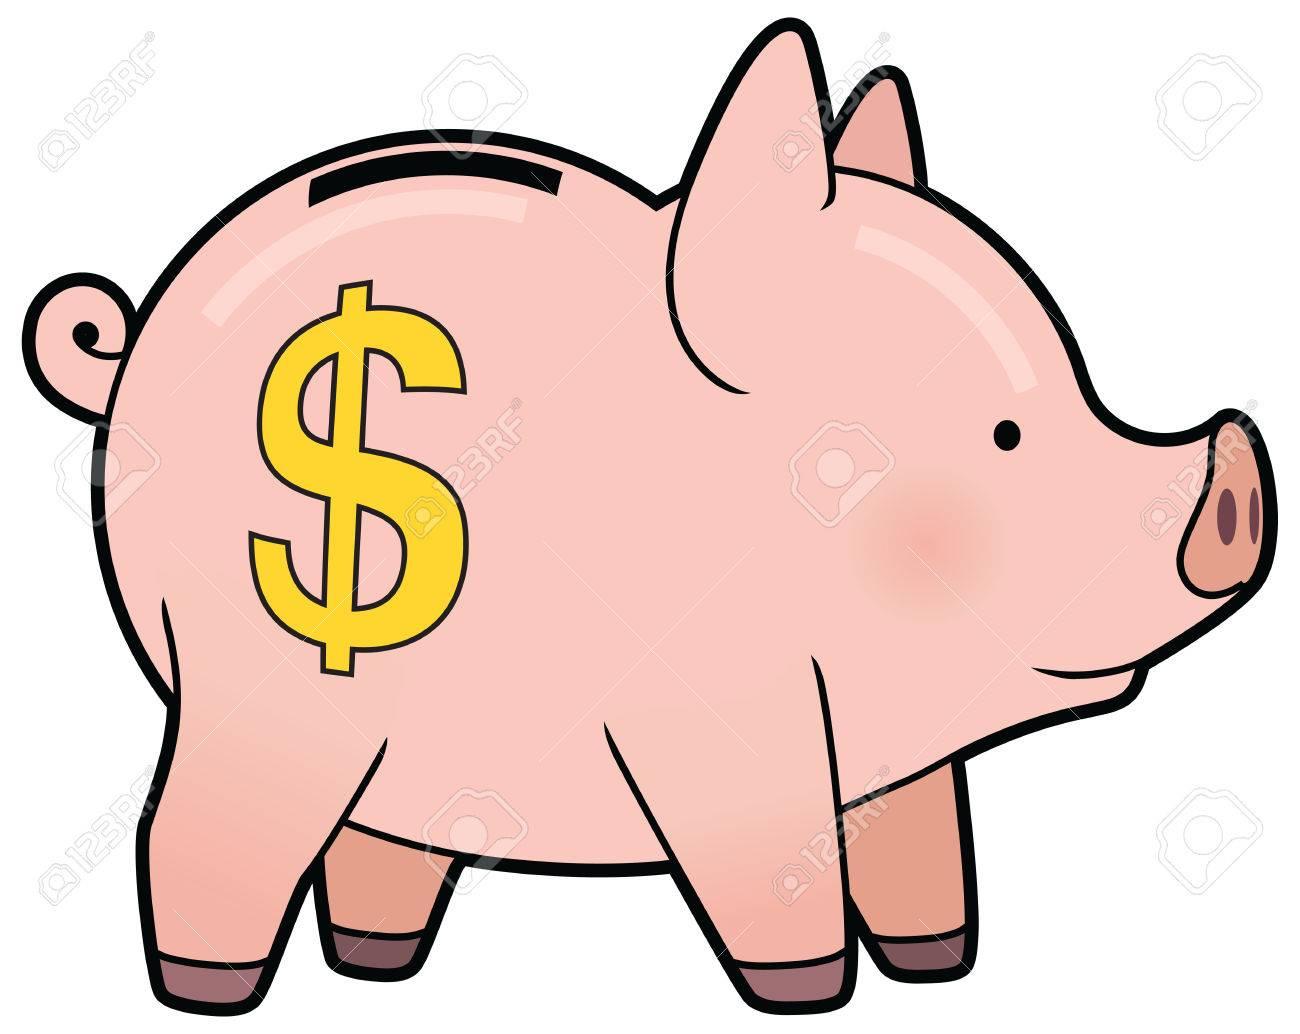 cartoon cute pink piggy bank vector royalty free cliparts vectors rh 123rf com Piggy Bank Graphic free piggy bank pictures clip art